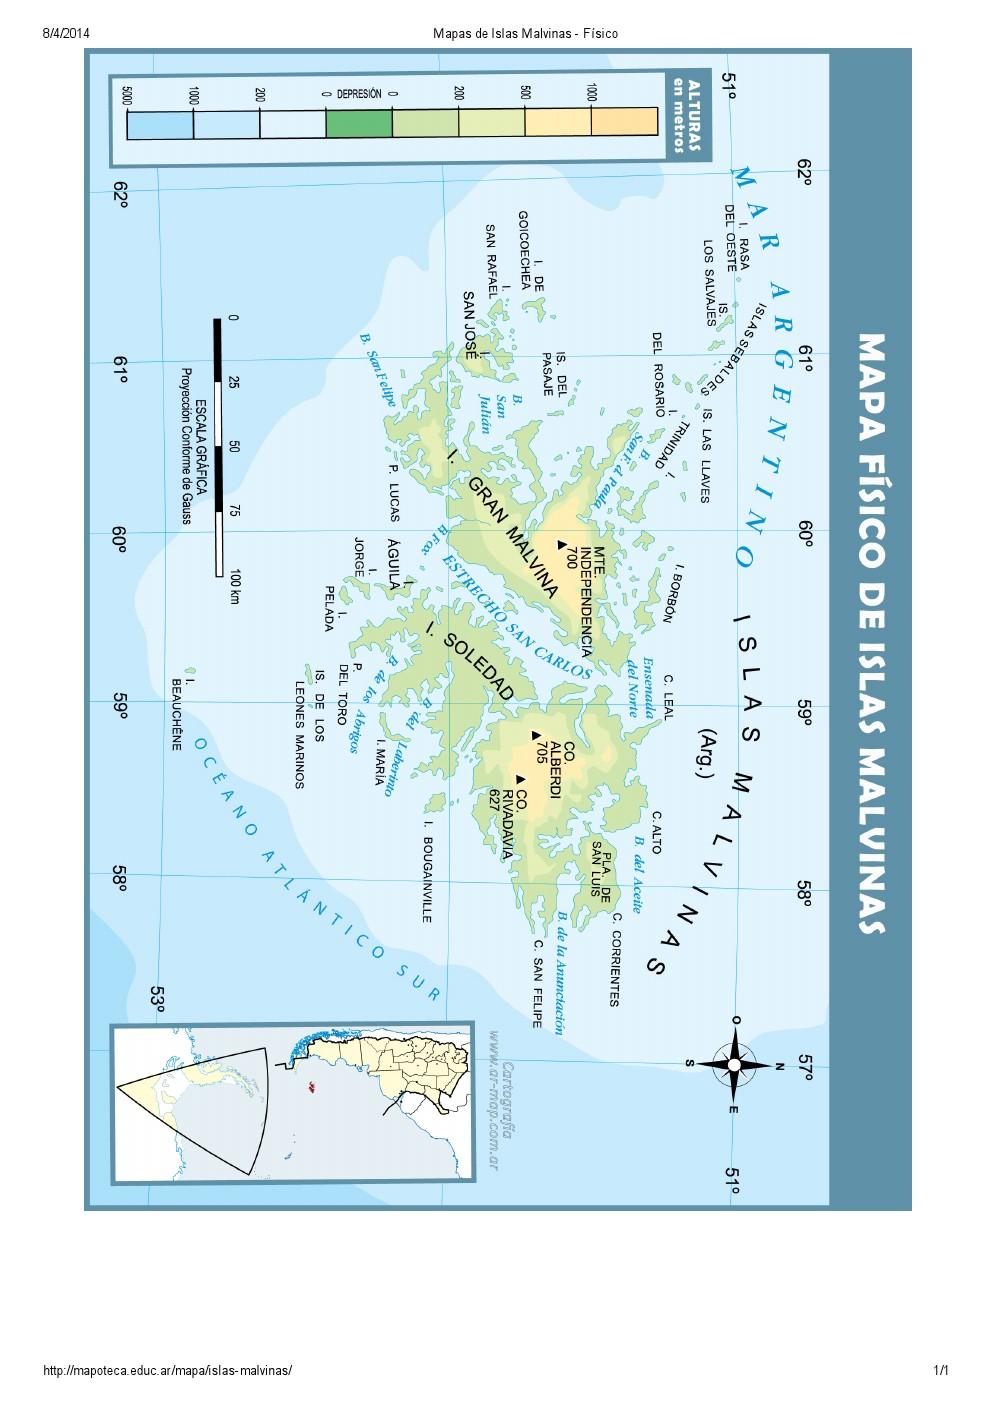 Mapa de relieve de las Islas Malvinas. Mapoteca de Educ.ar